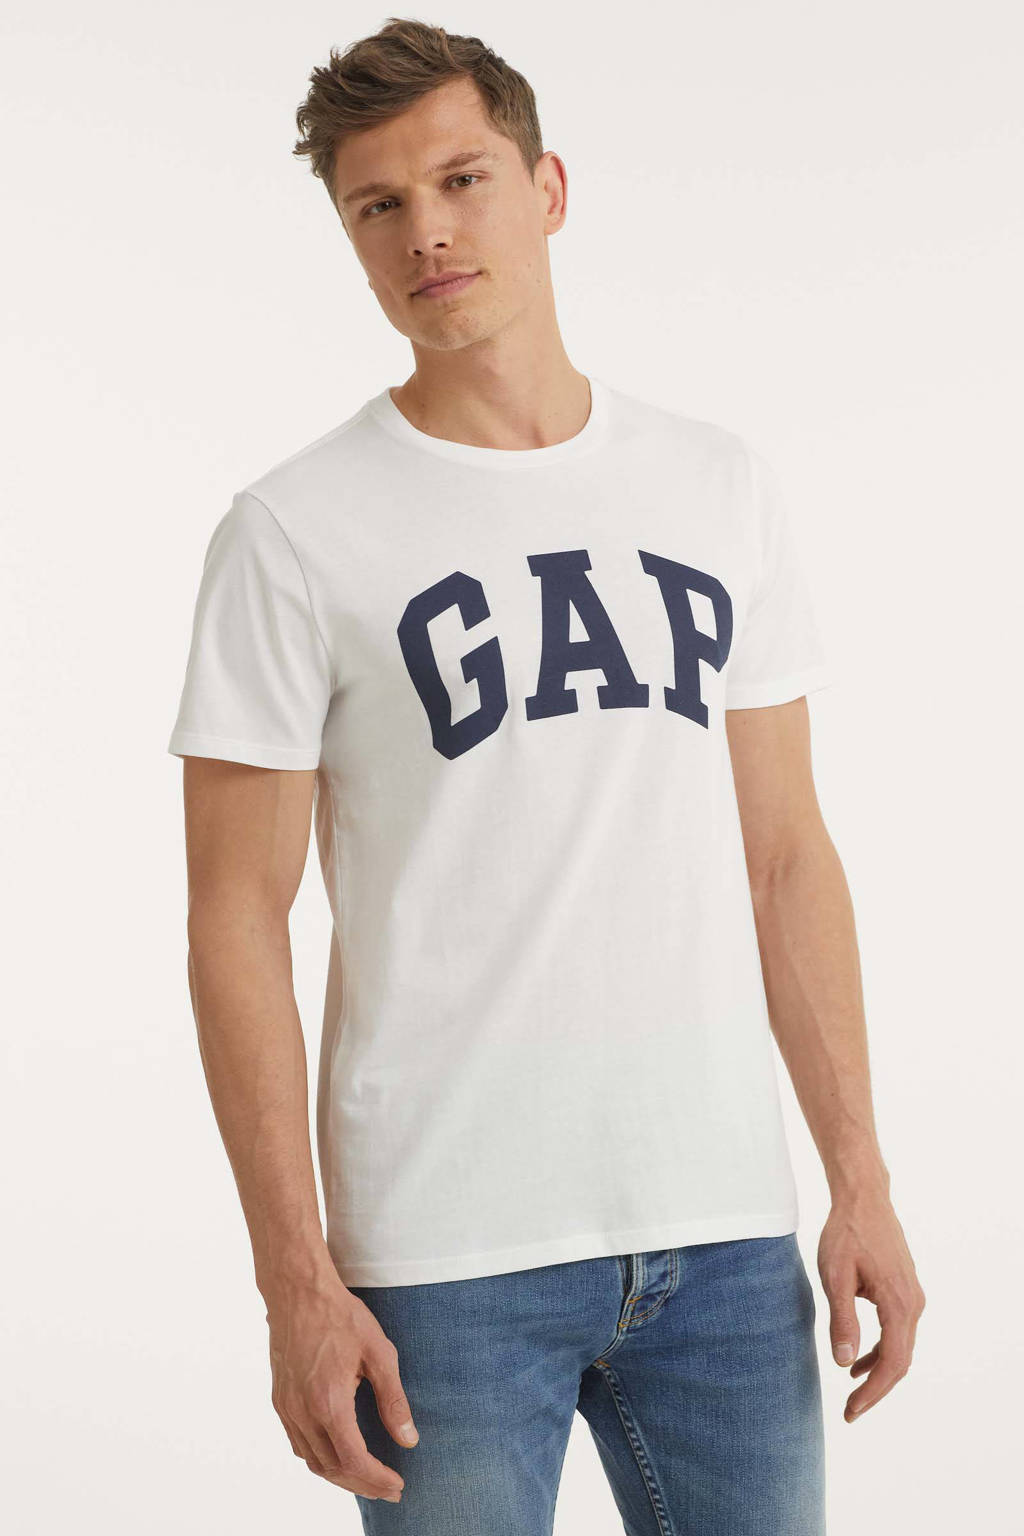 GAP T-shirt (set van 2 ) donkerblauw/wit, Donkerblauw/wit